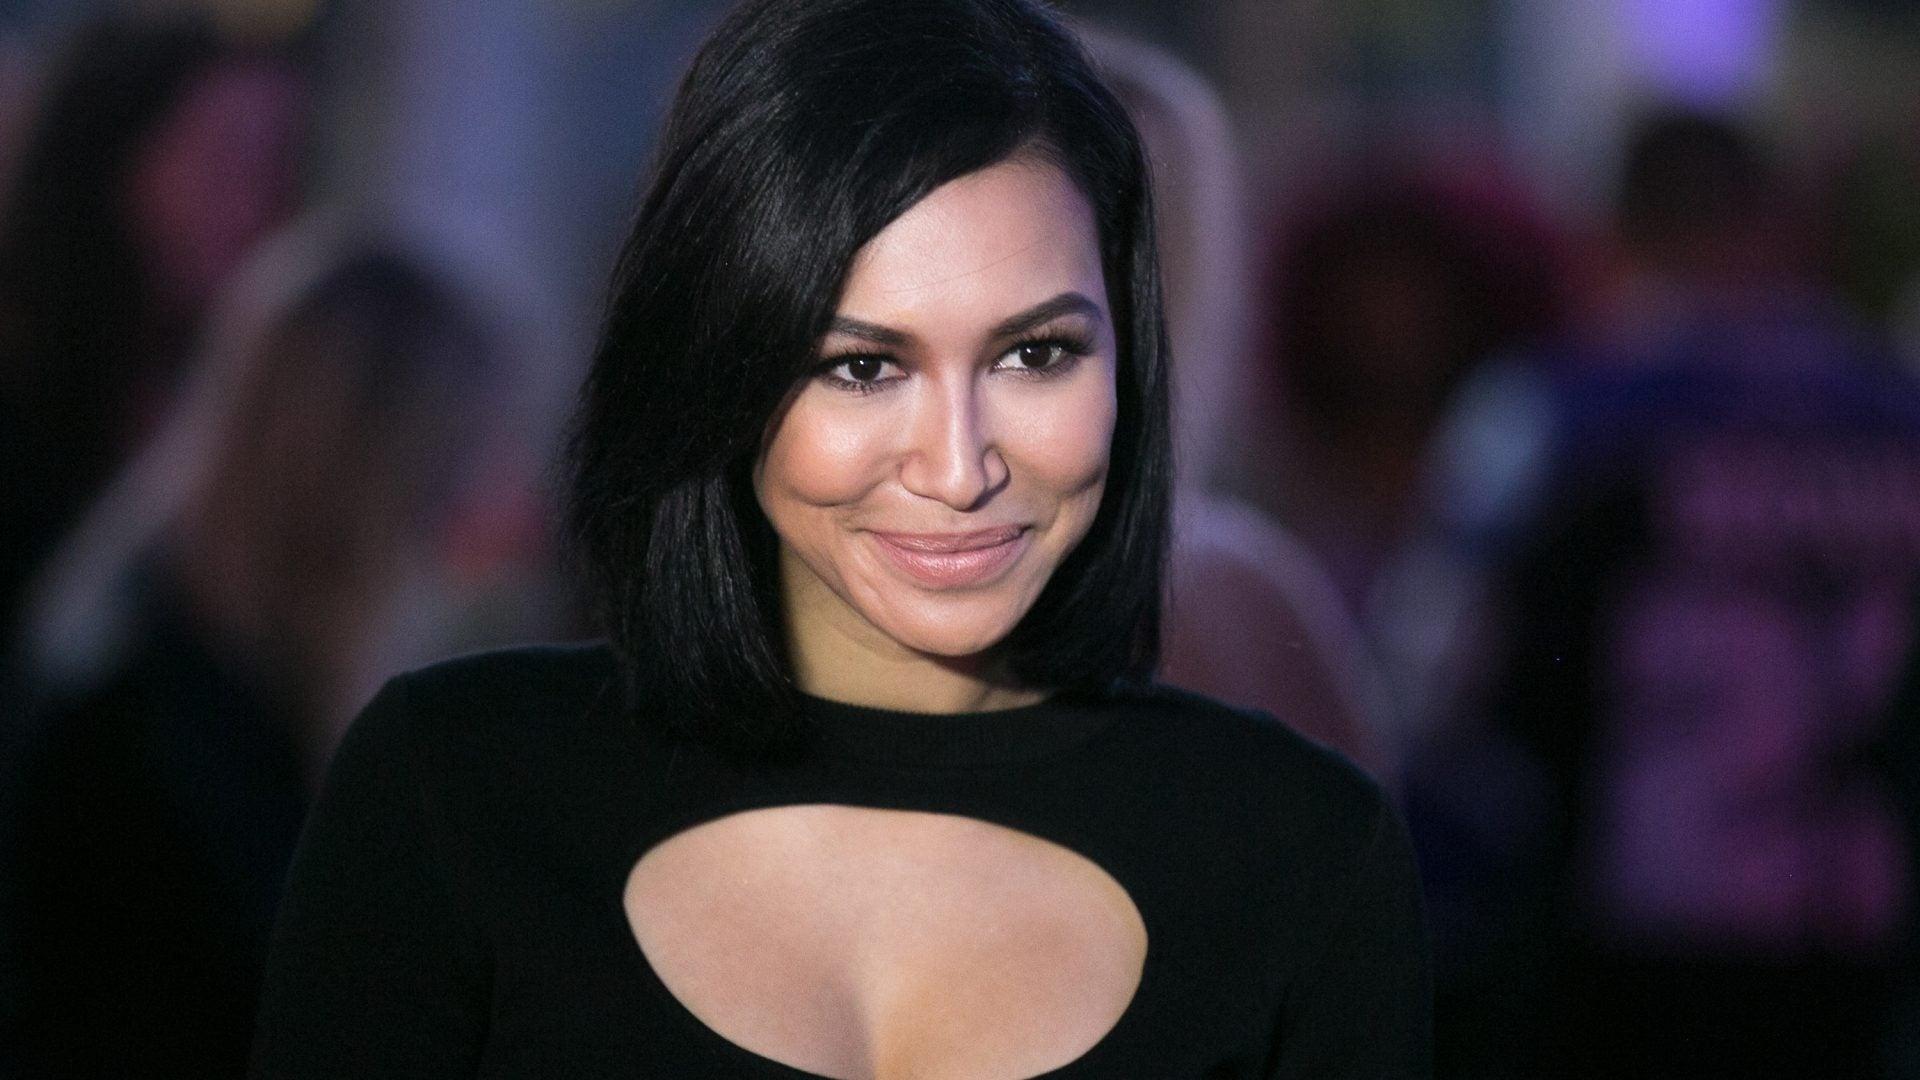 'Glee' Star Naya Rivera: Body Recovered In Lake Piru